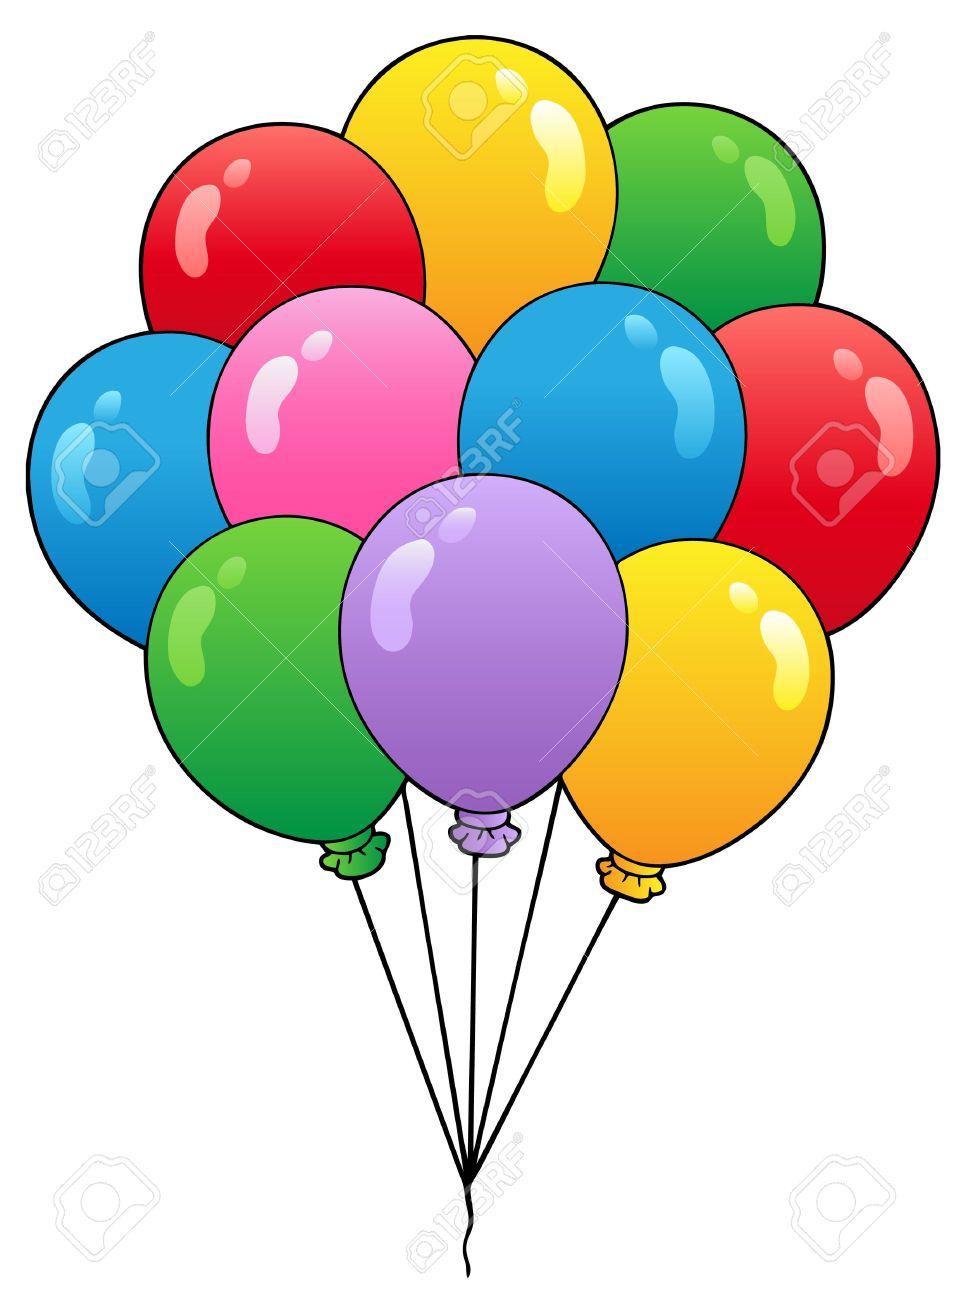 group of cartoon balloons royalty free cliparts vectors and stock rh 123rf com cartoon balloon making noise cartoon balloons with 92 on them